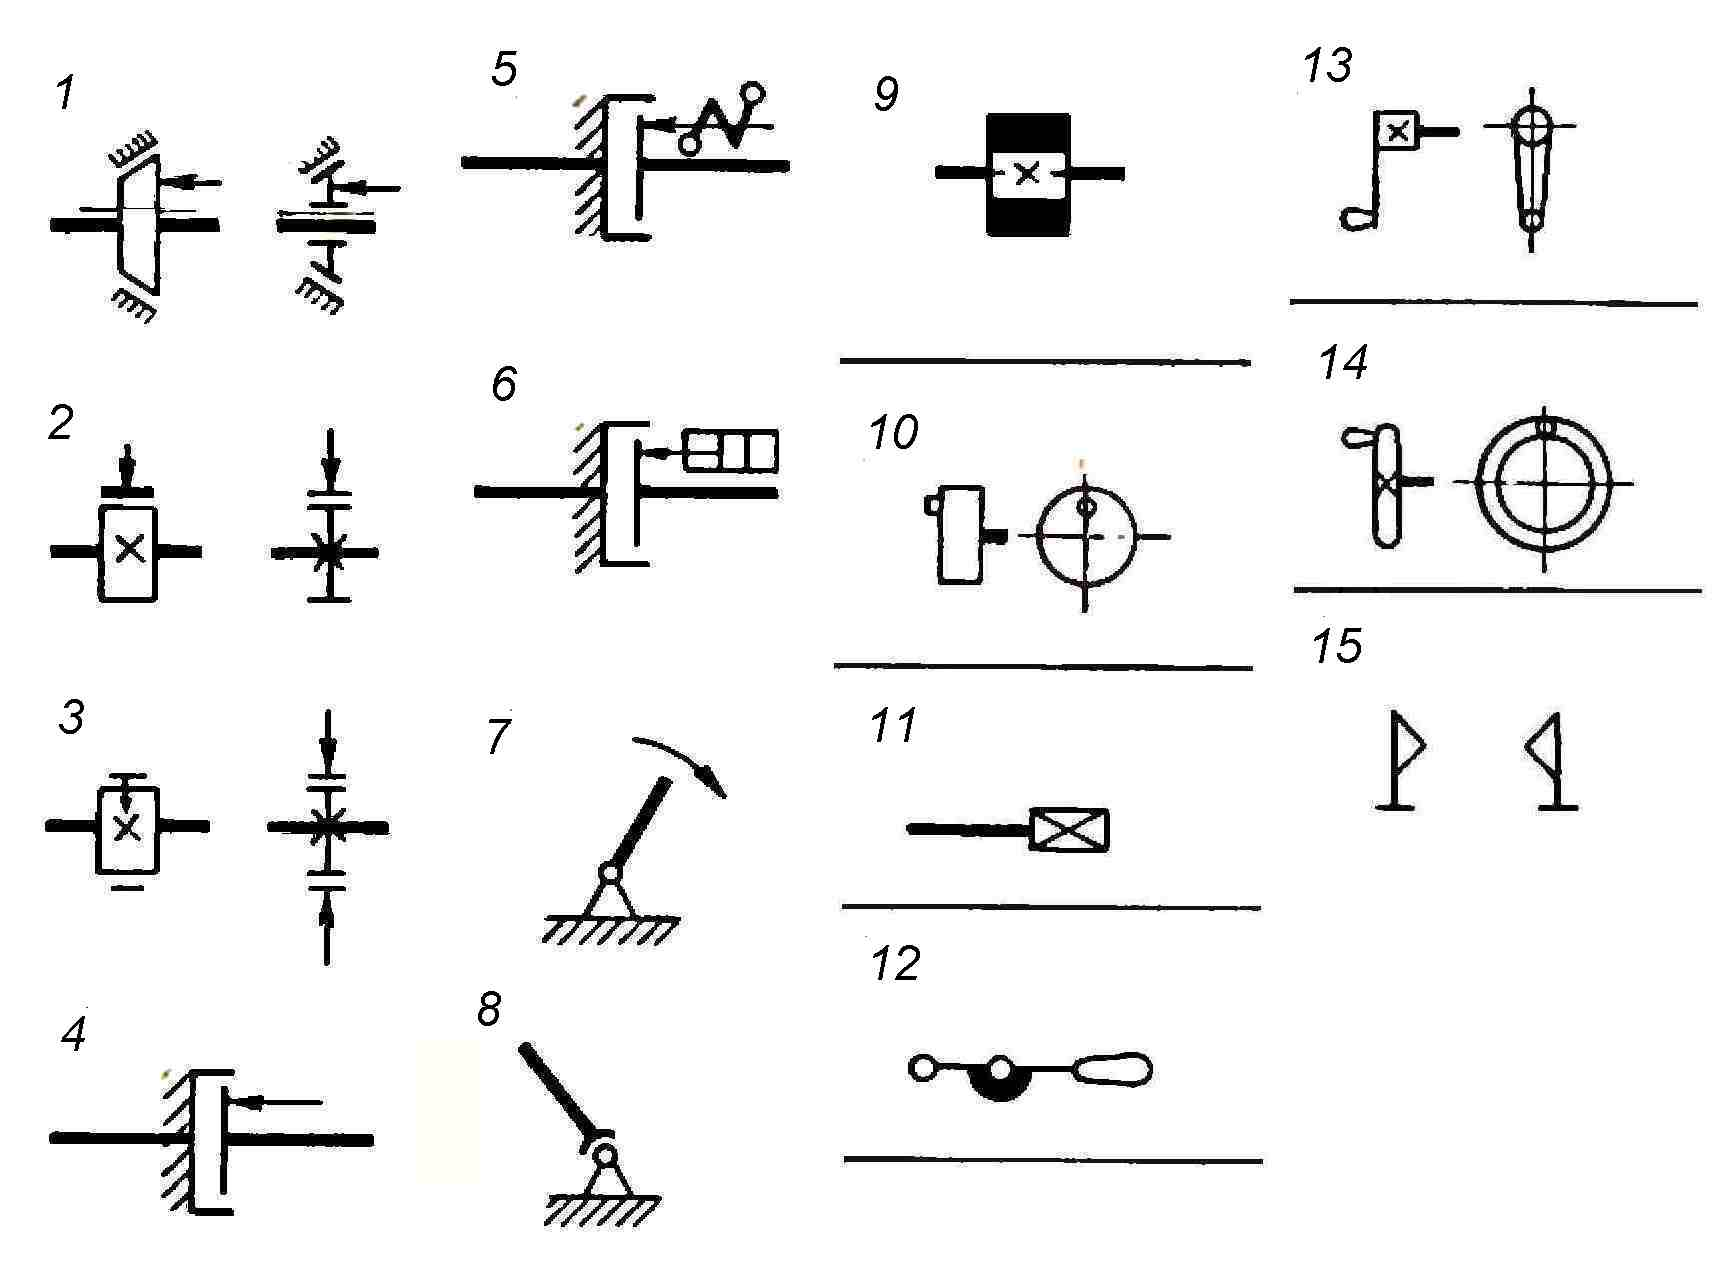 electromagnetic brake diagram